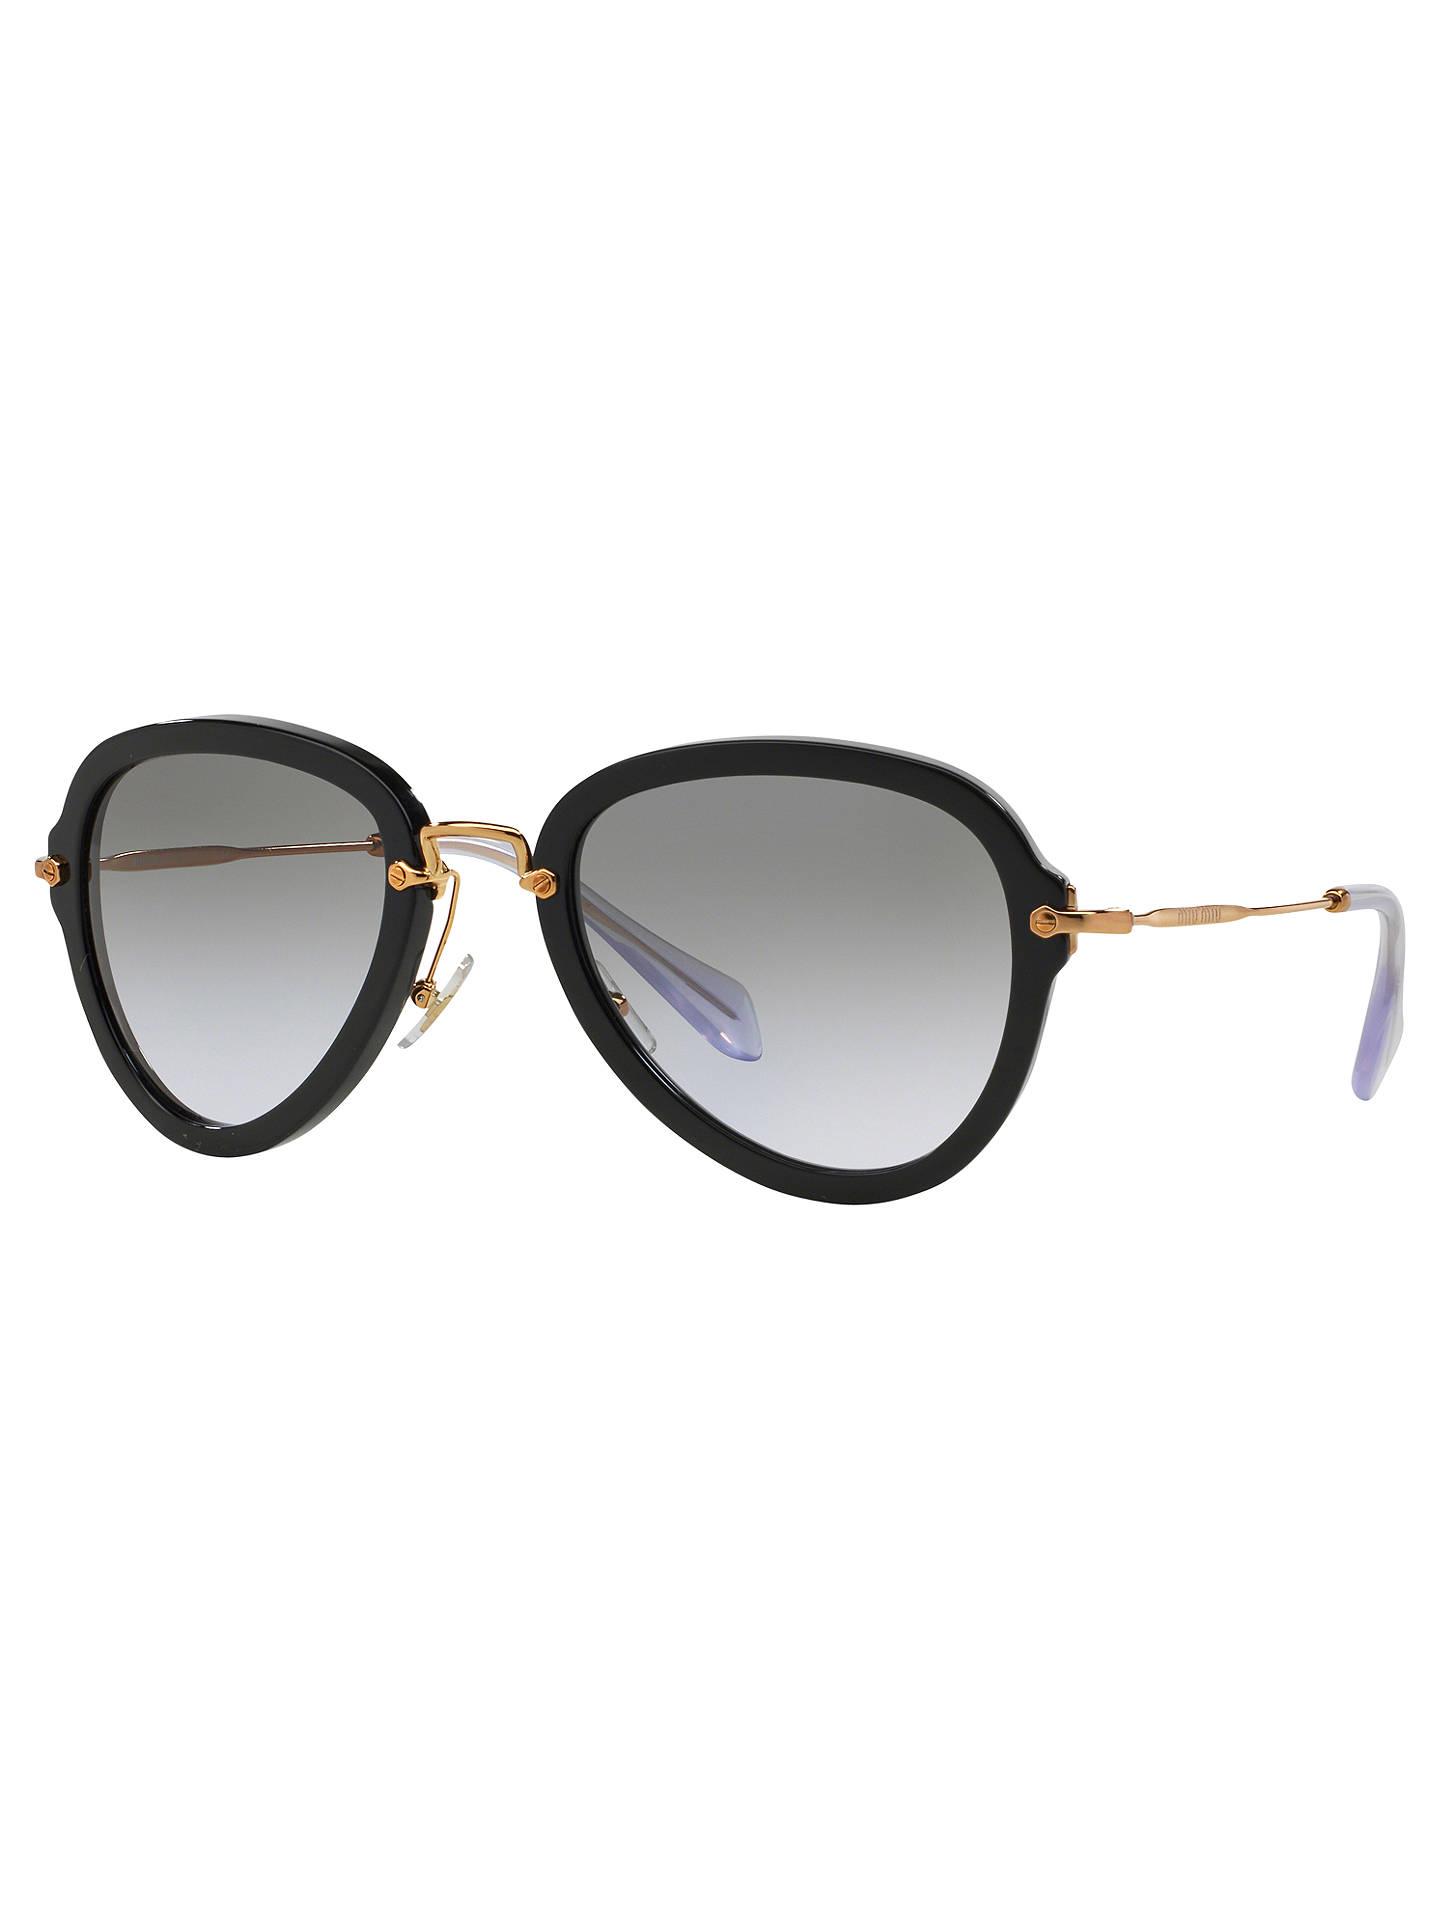 cb67d6494 Buy Miu Miu MU03QS Aviator Sunglasses, Black Online at johnlewis.com ...